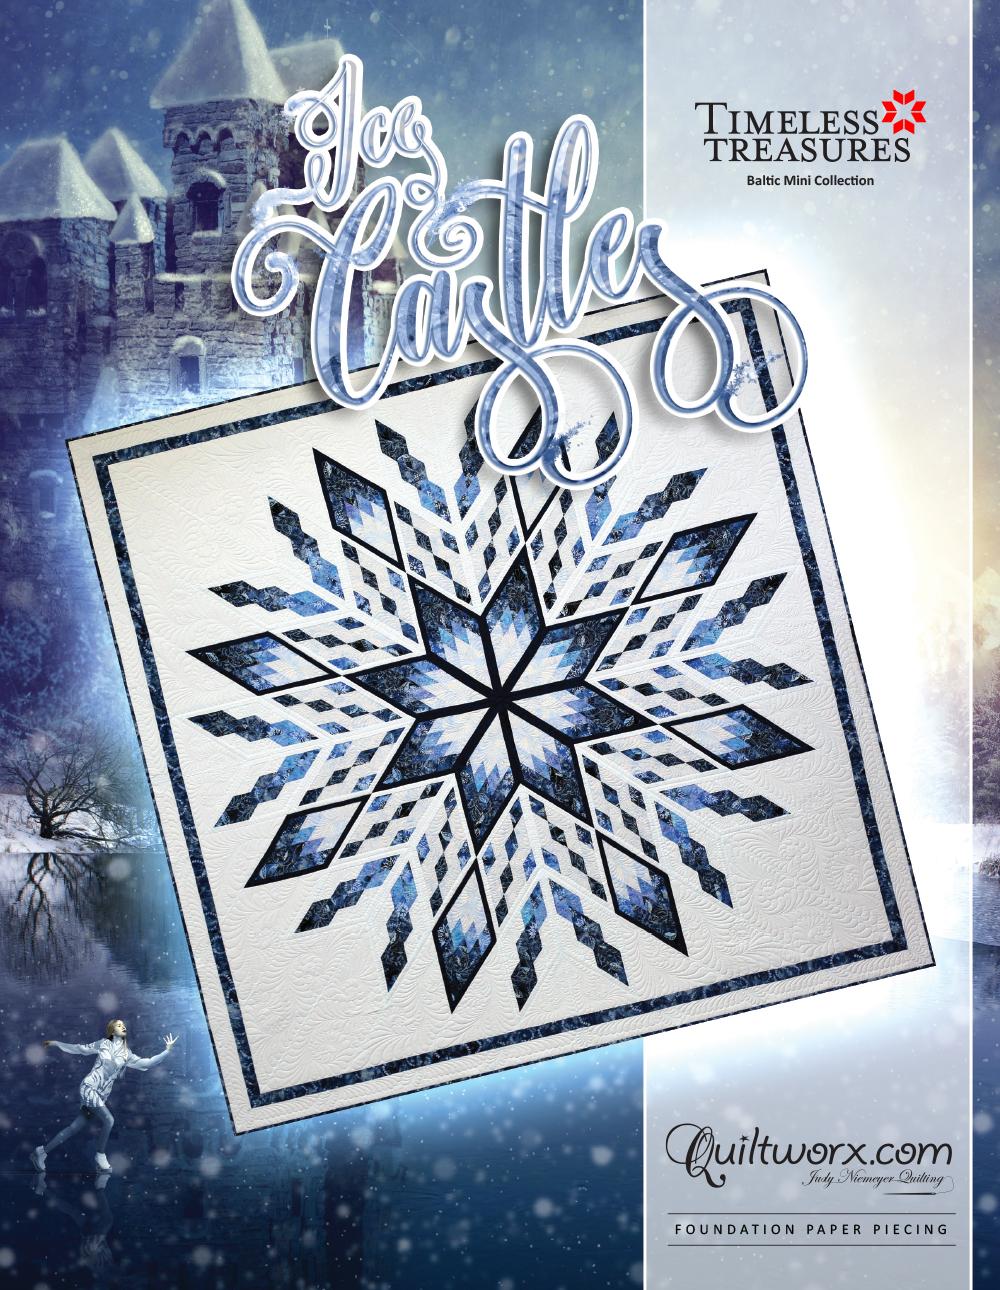 Ice-Castles-Baltic-CS